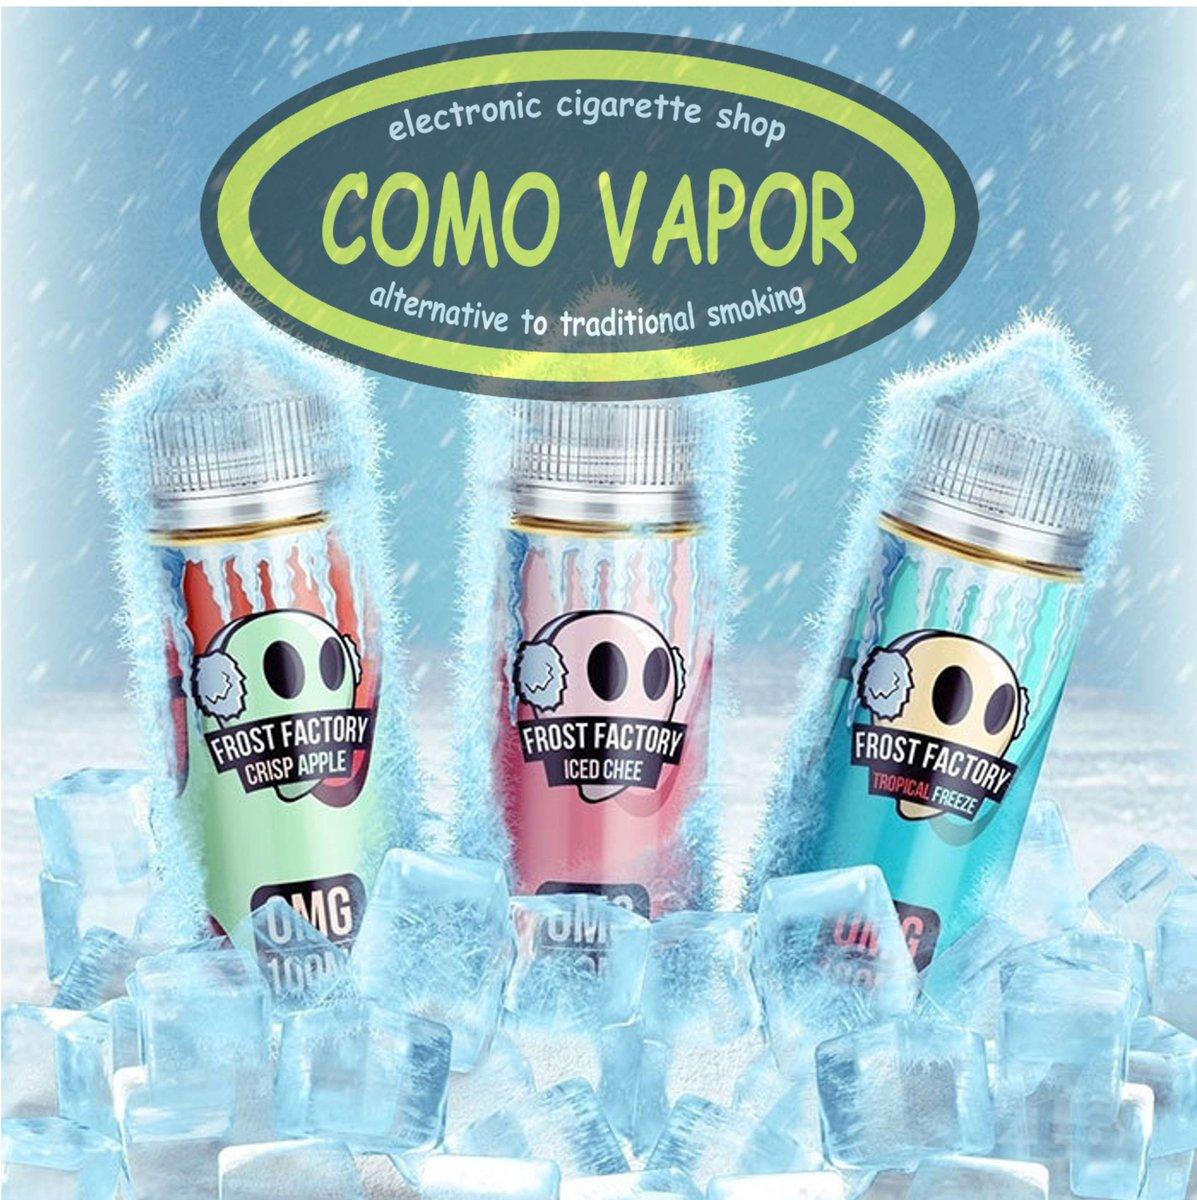 Como Vapor Comovapor Twitter E Juice Liquid Frosty Juiceango Apple Original 100 Not Ejm Crisp Apples That Have Been Chilled To Perfection Mu Mizzou Vapepic Bxoago6nr2